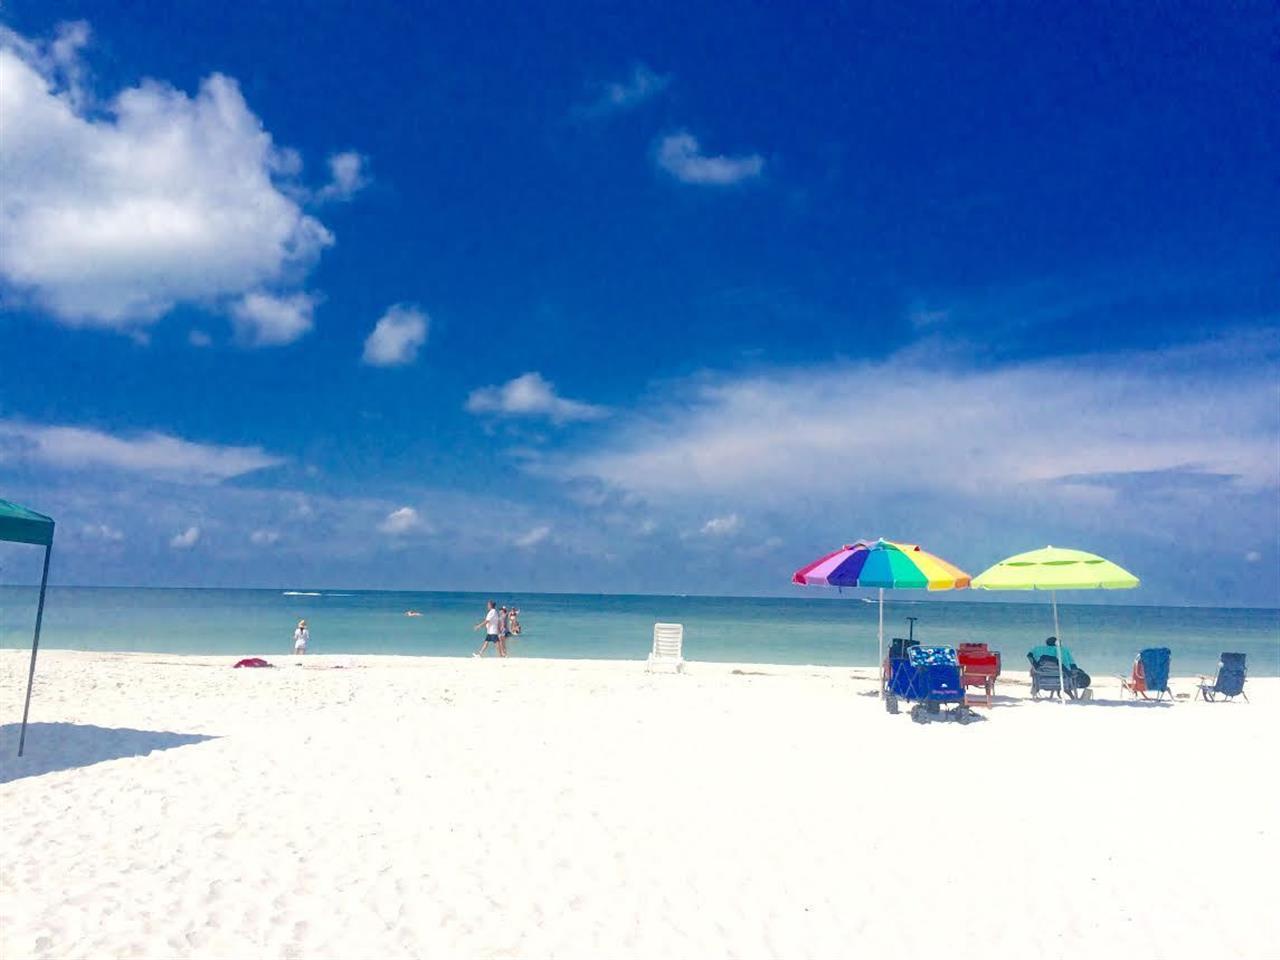 St. Petersburg beach #sunshinestate #tampabay #florida